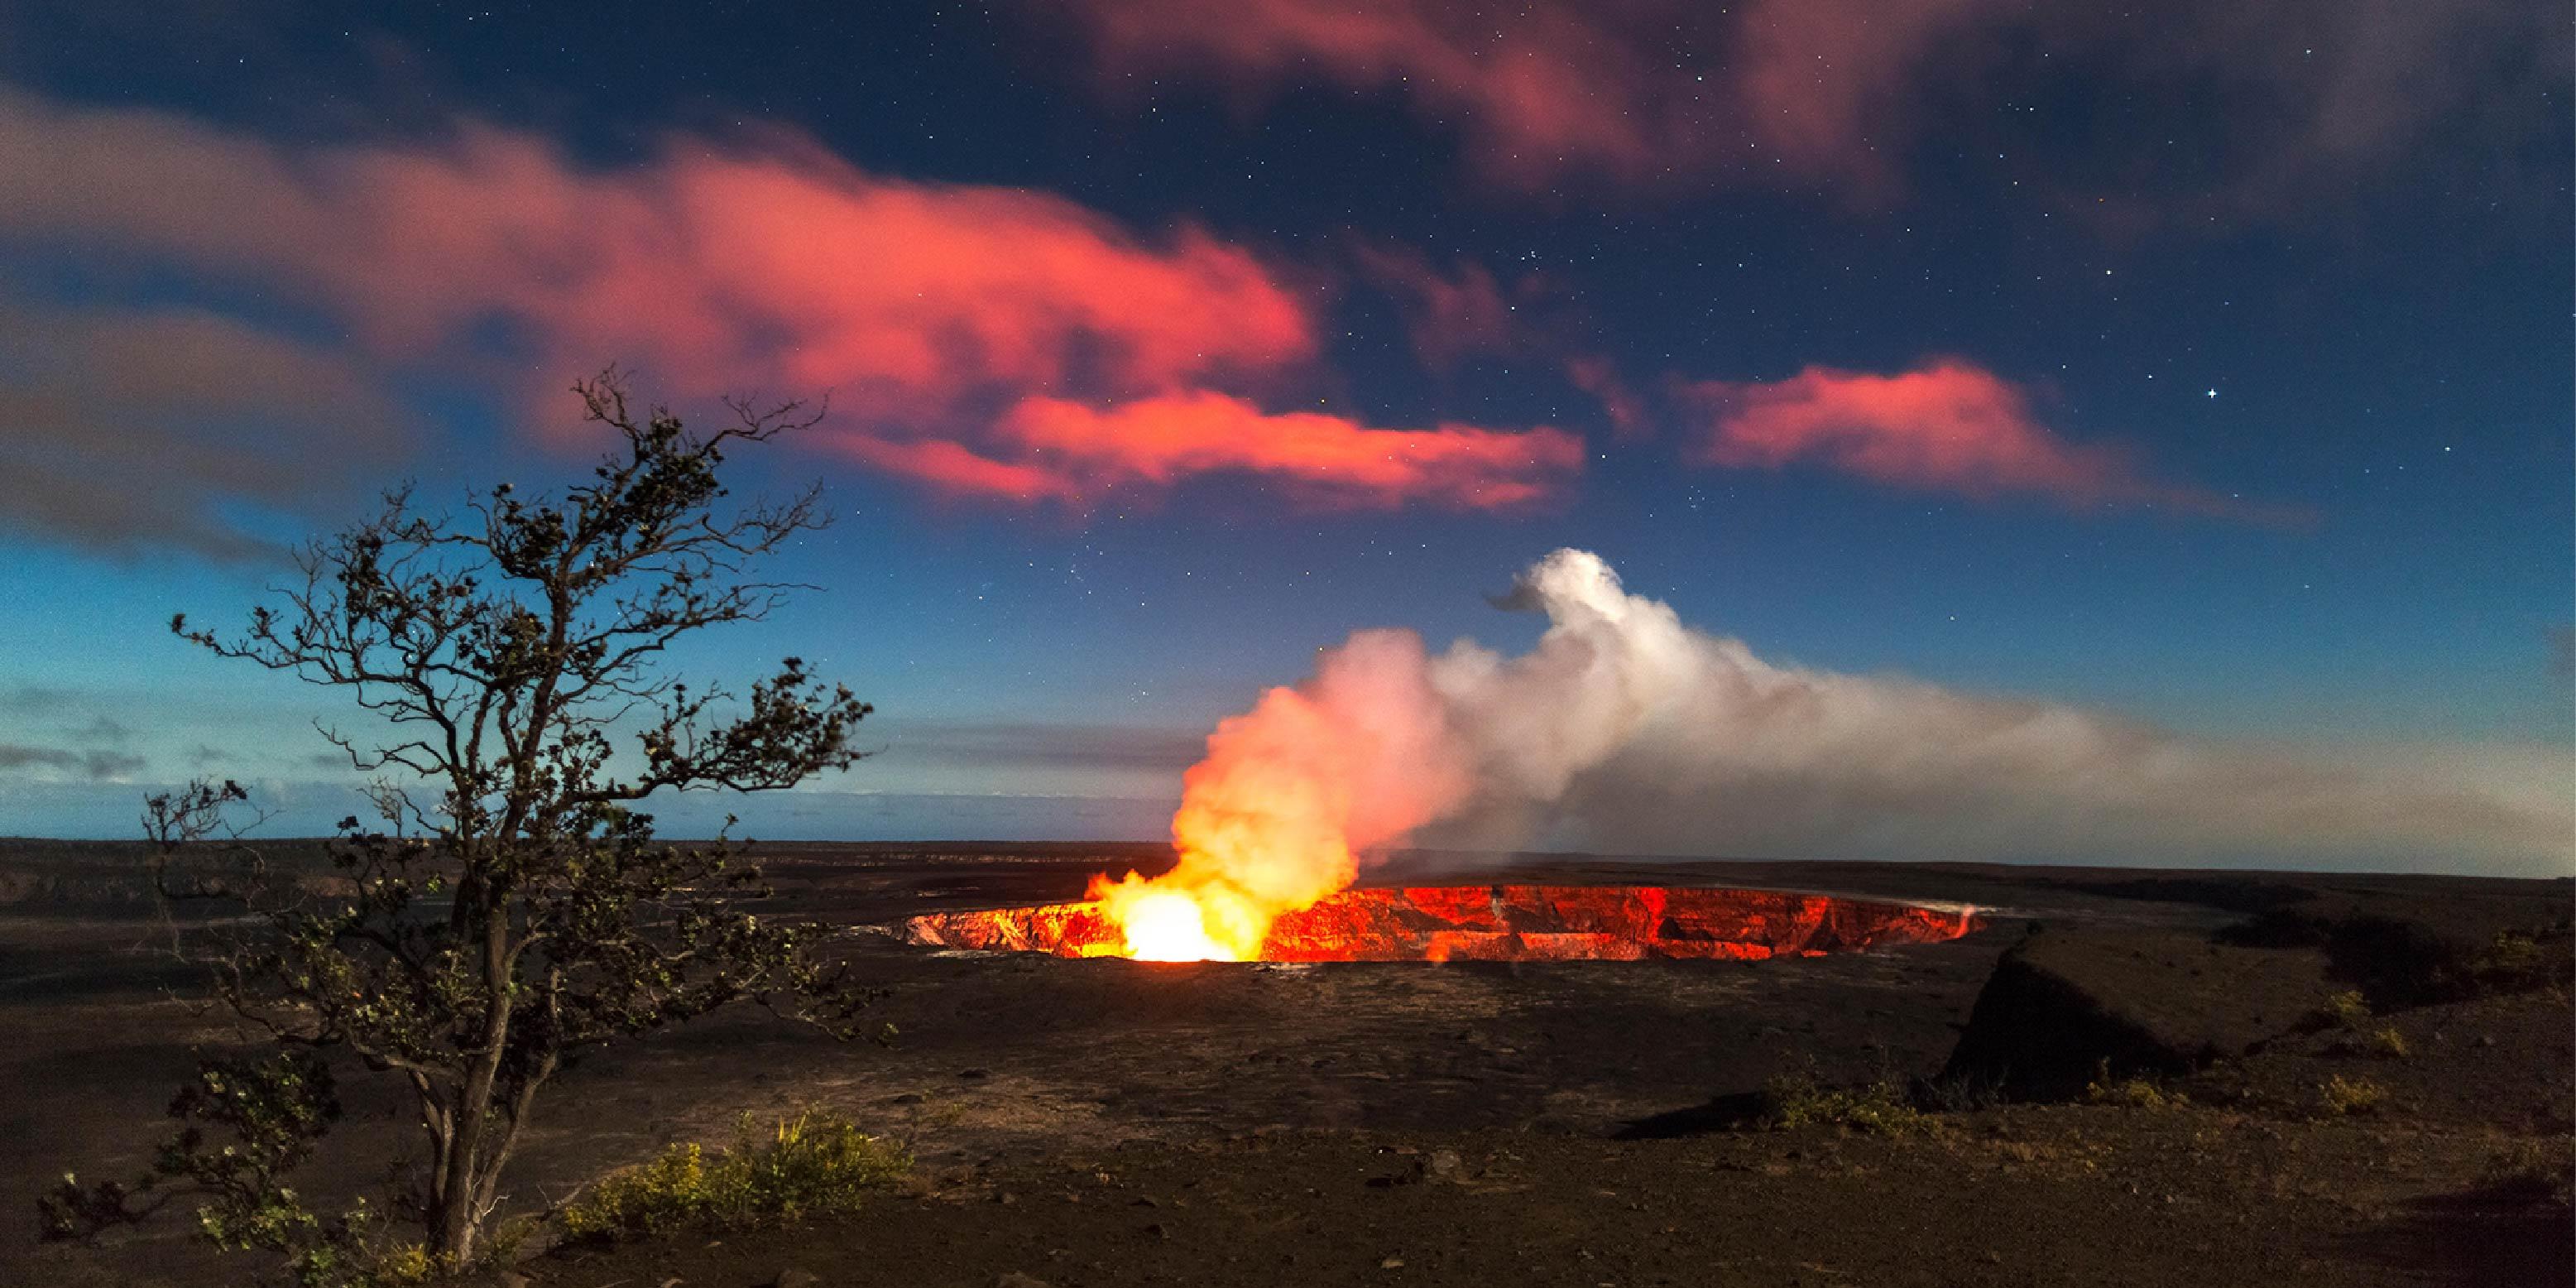 M 4 5 Earthquake Highlights Hawaii S Tectonic Past Present And Future